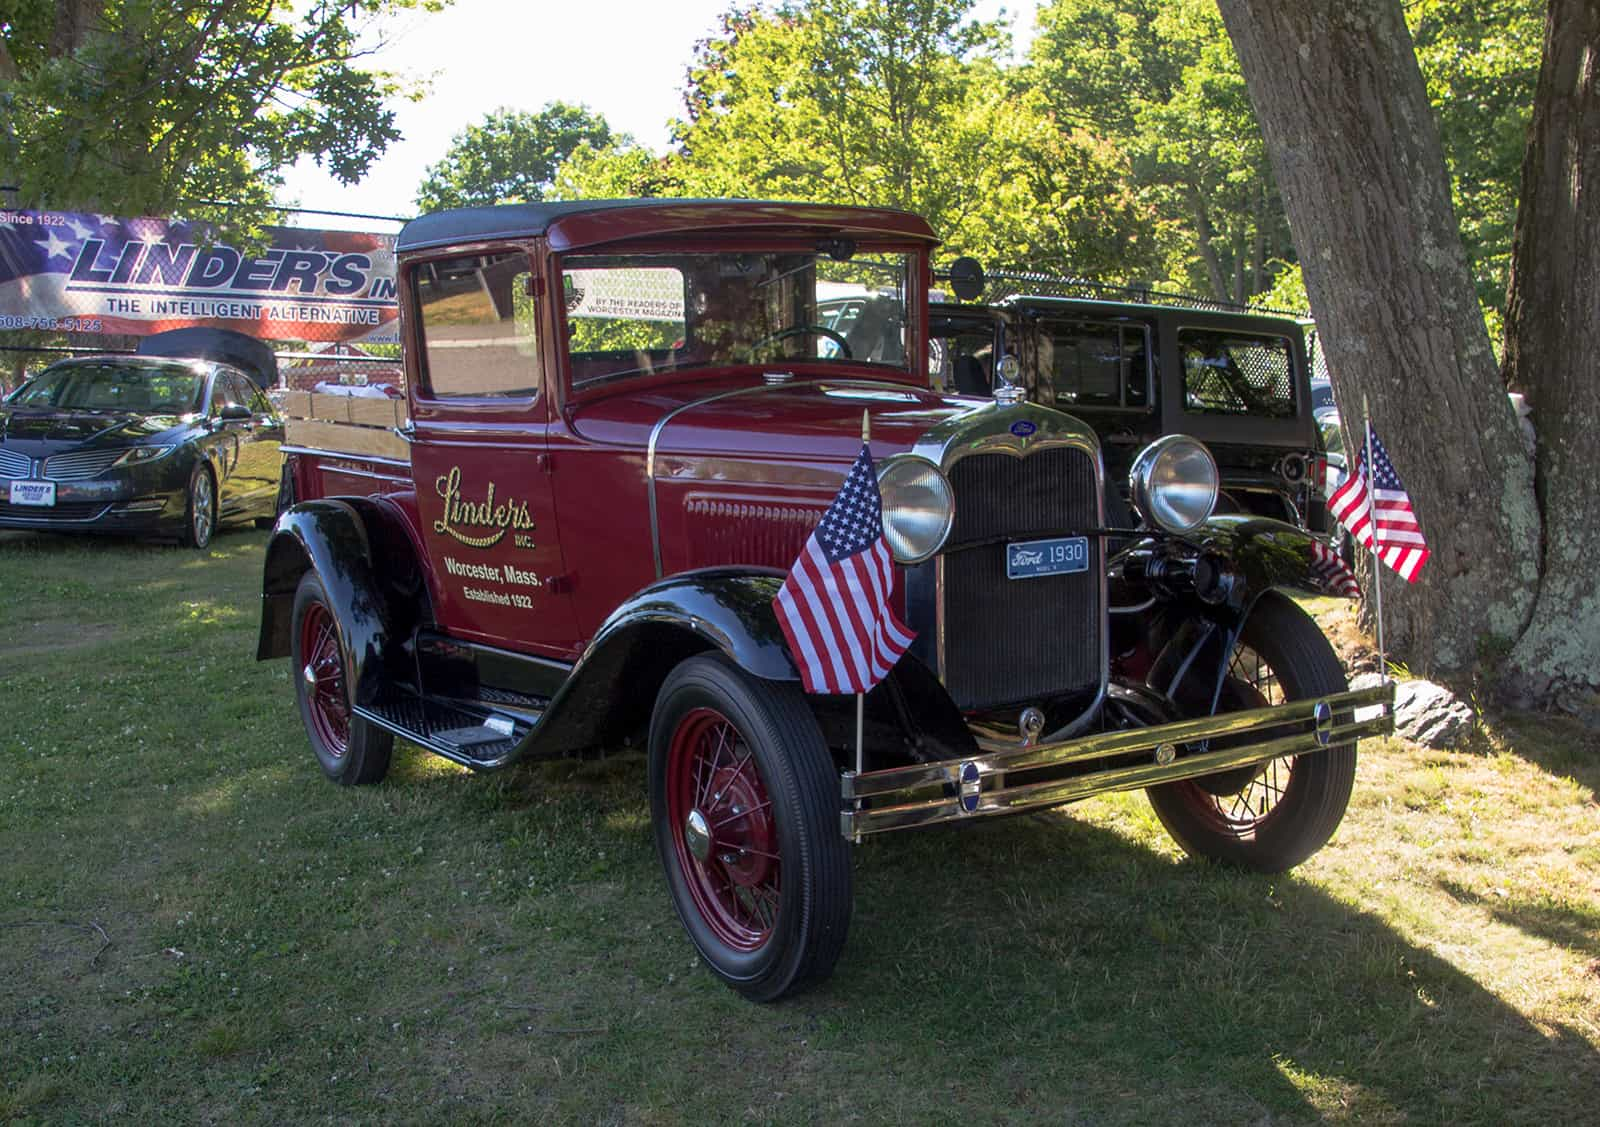 2016 Cars of Summer - Linder's - Worcester MA